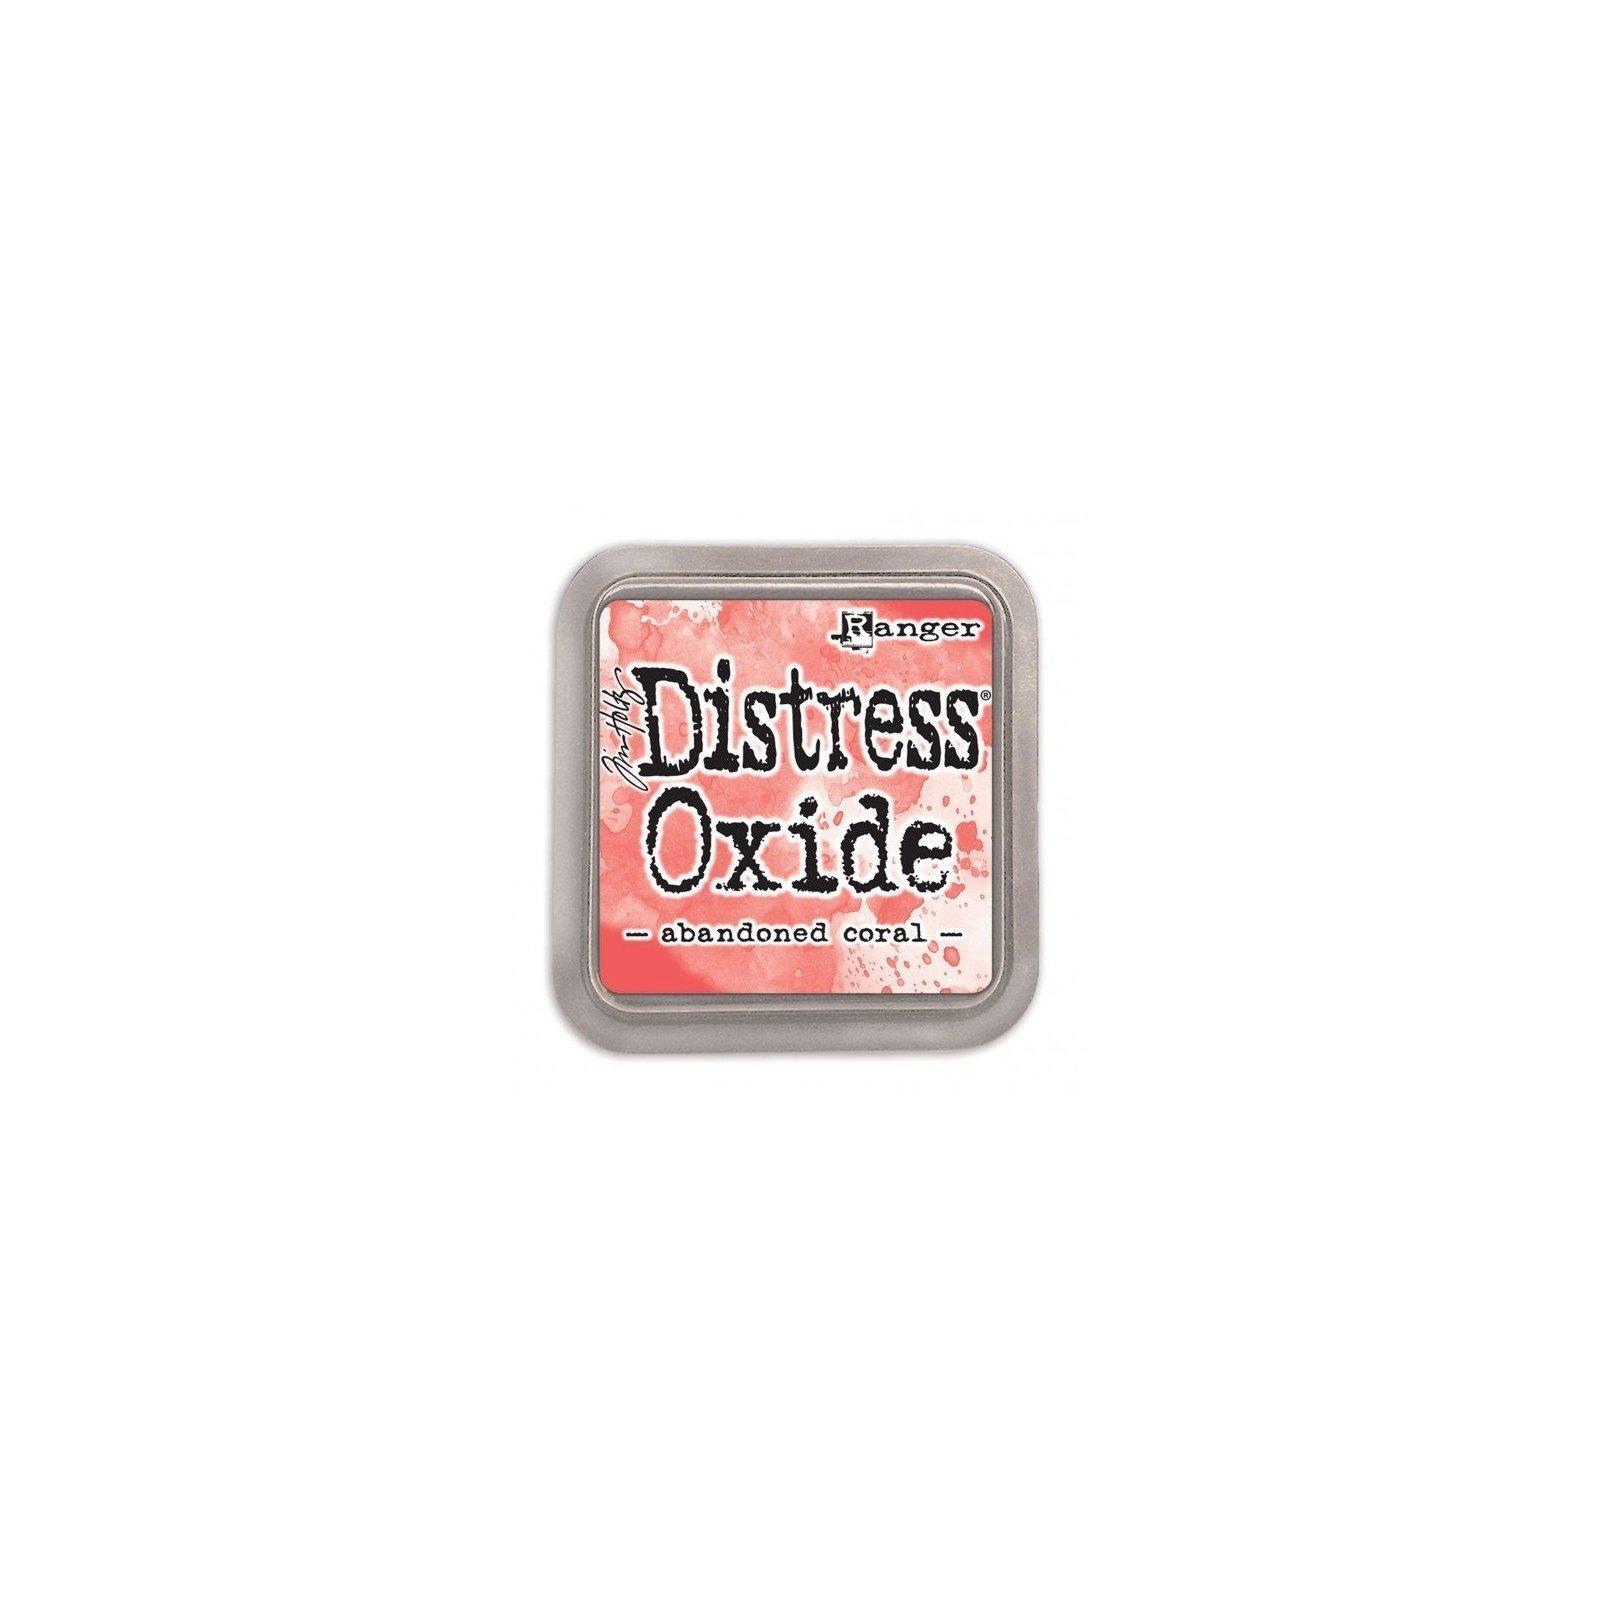 Grand encreur corail Distress Oxide - Abandoned Coral - Ranger